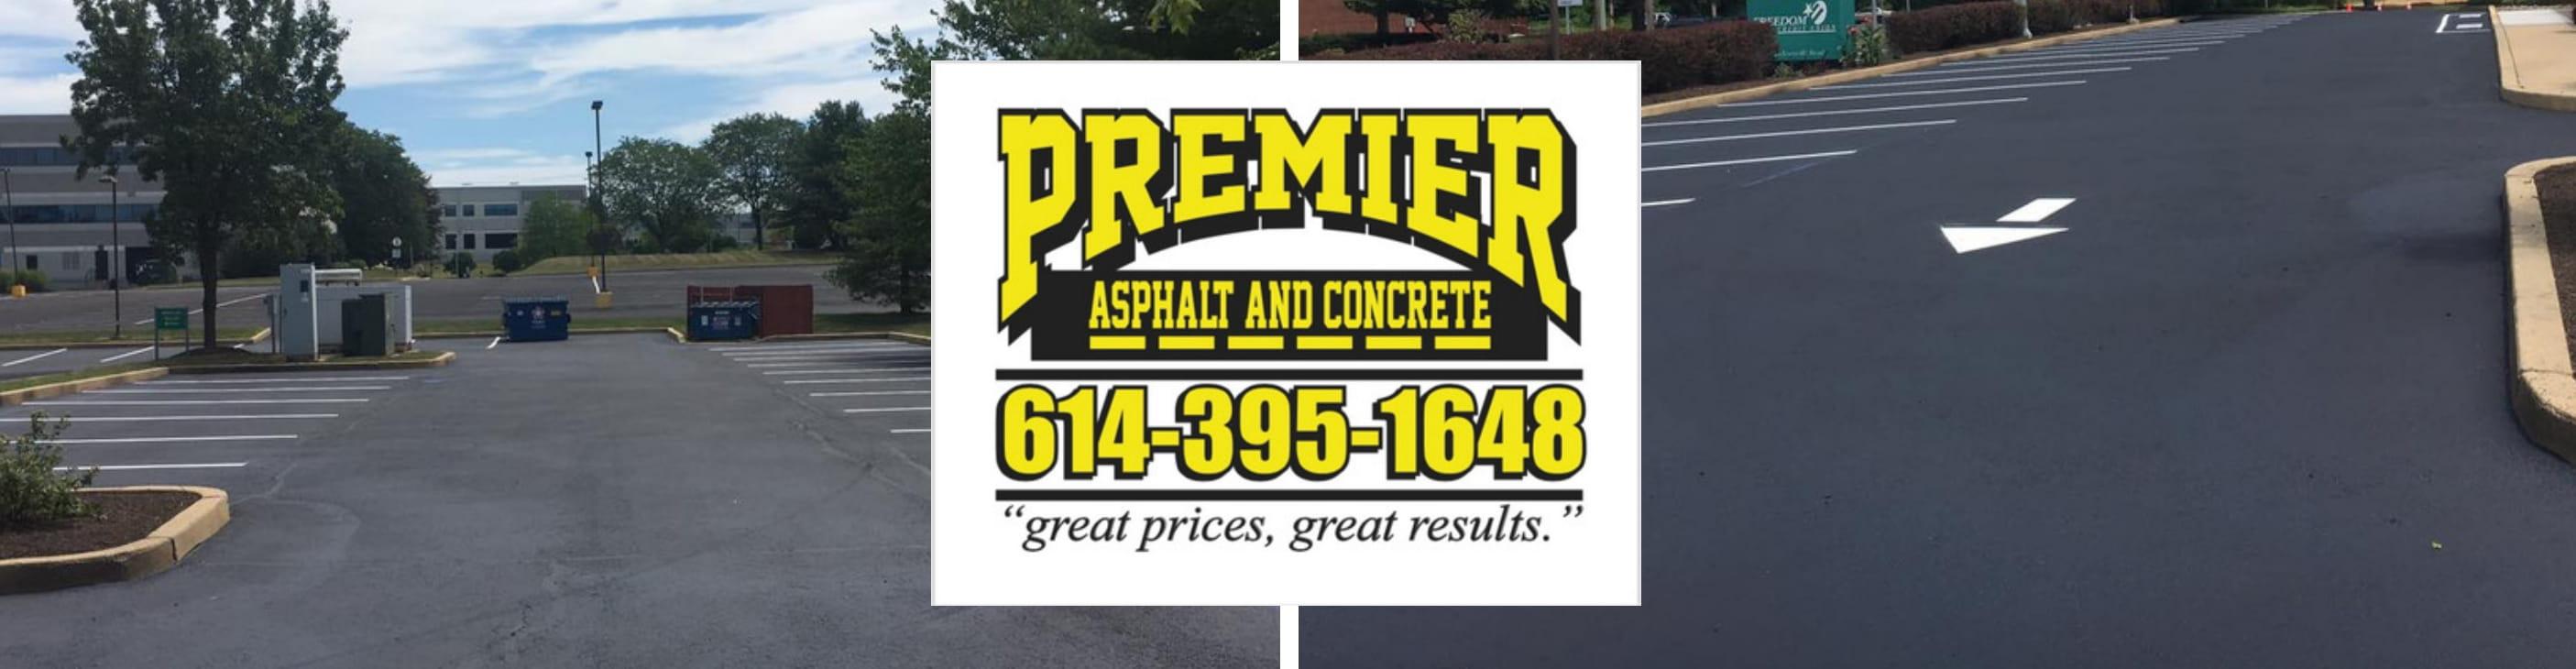 Asphalt Repair Contractor